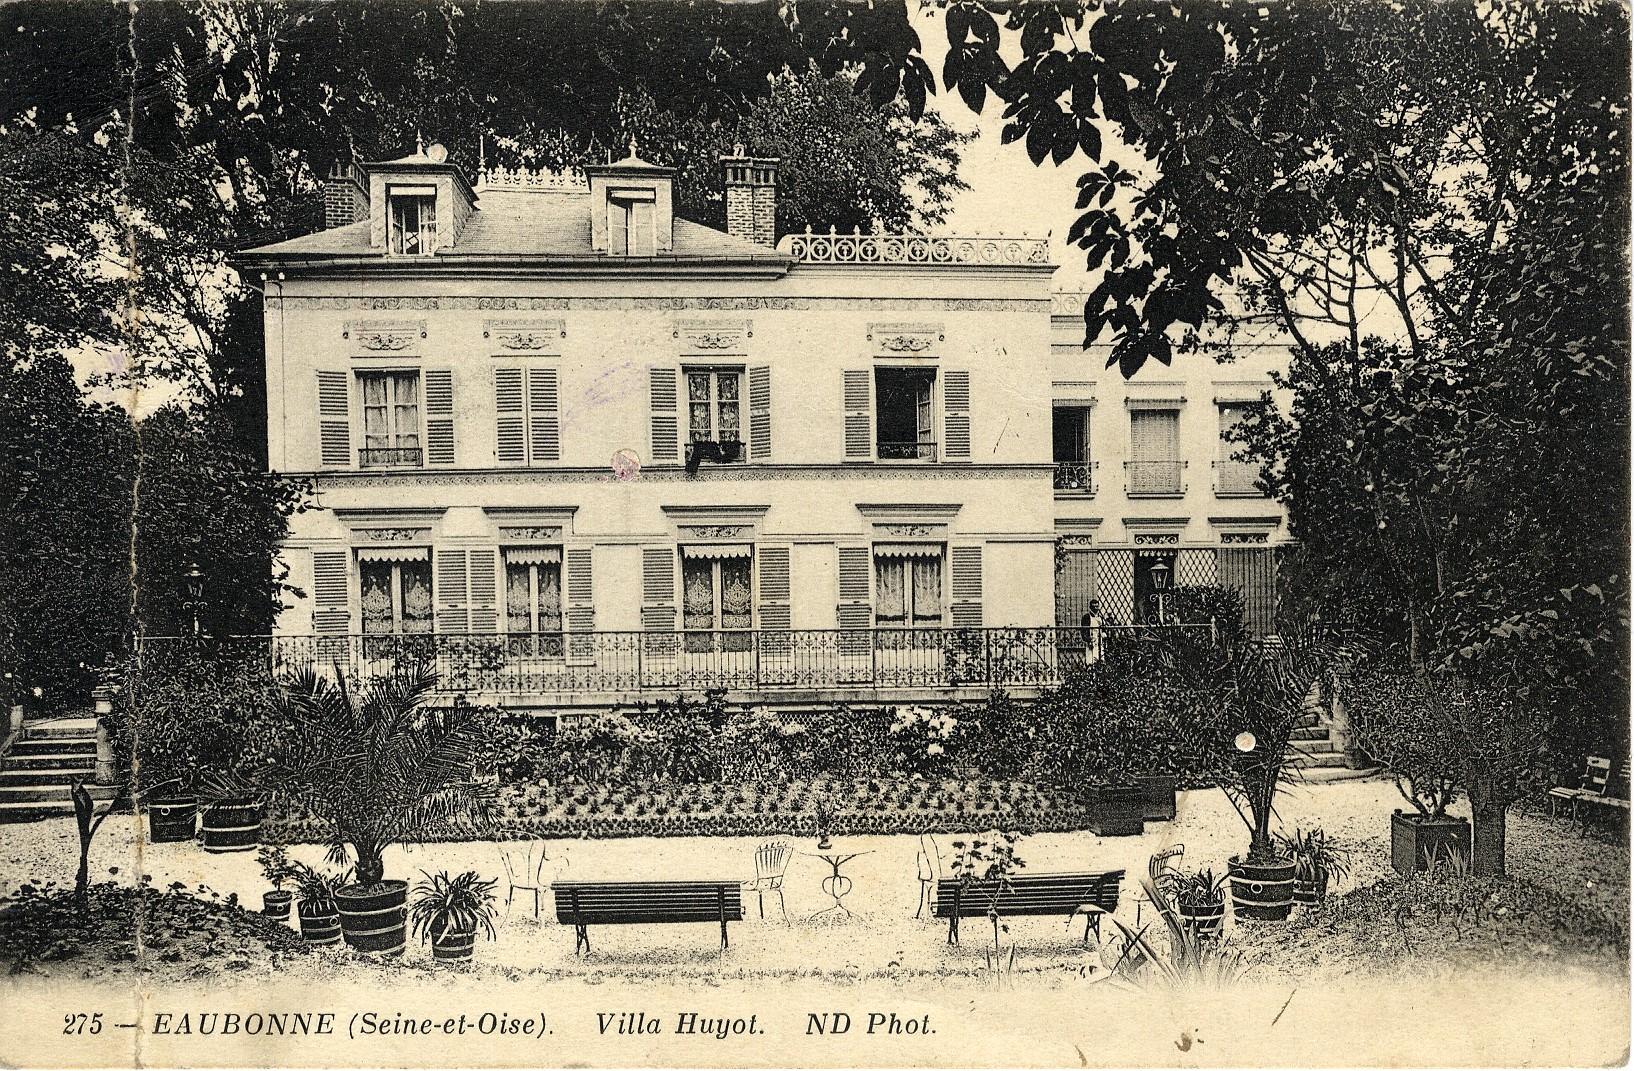 Villa Huyot à Eaubonne